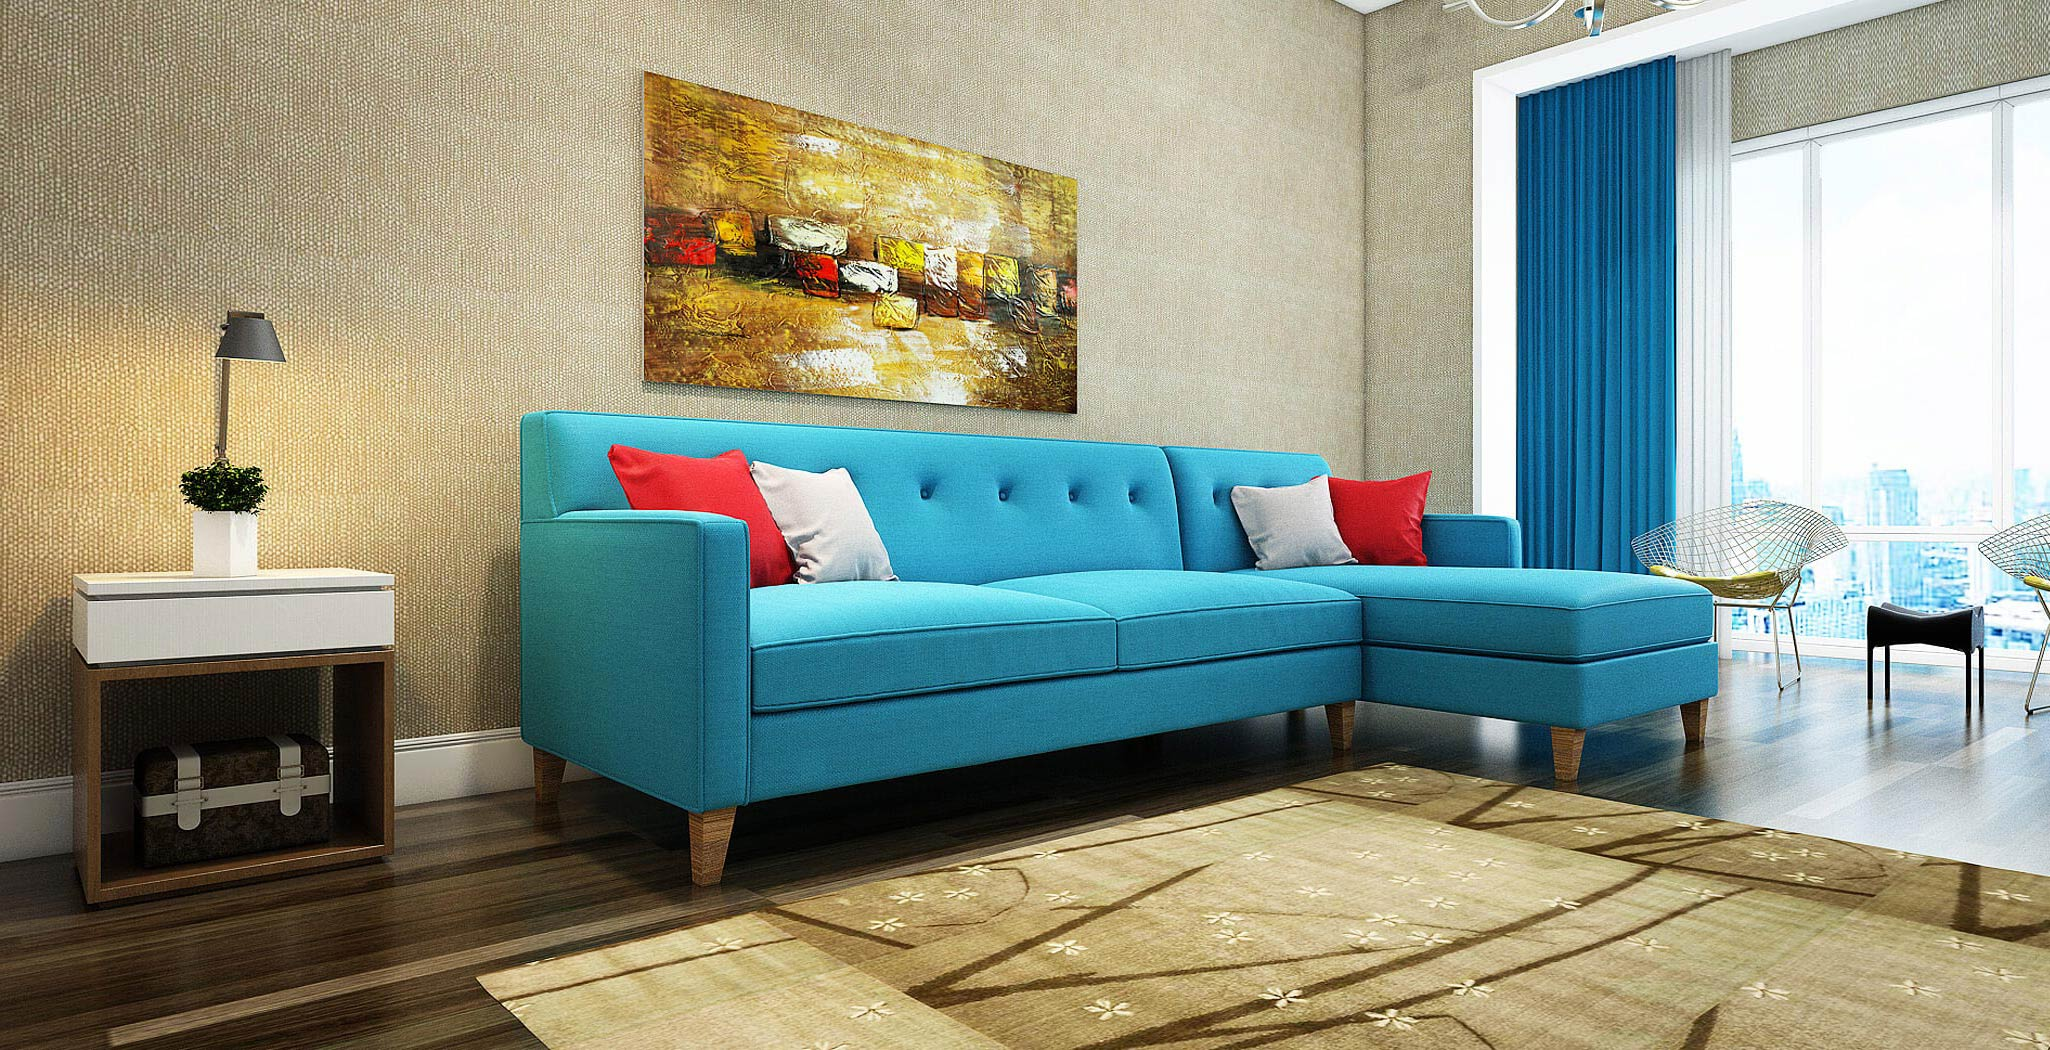 harper panel furniture gallery 5